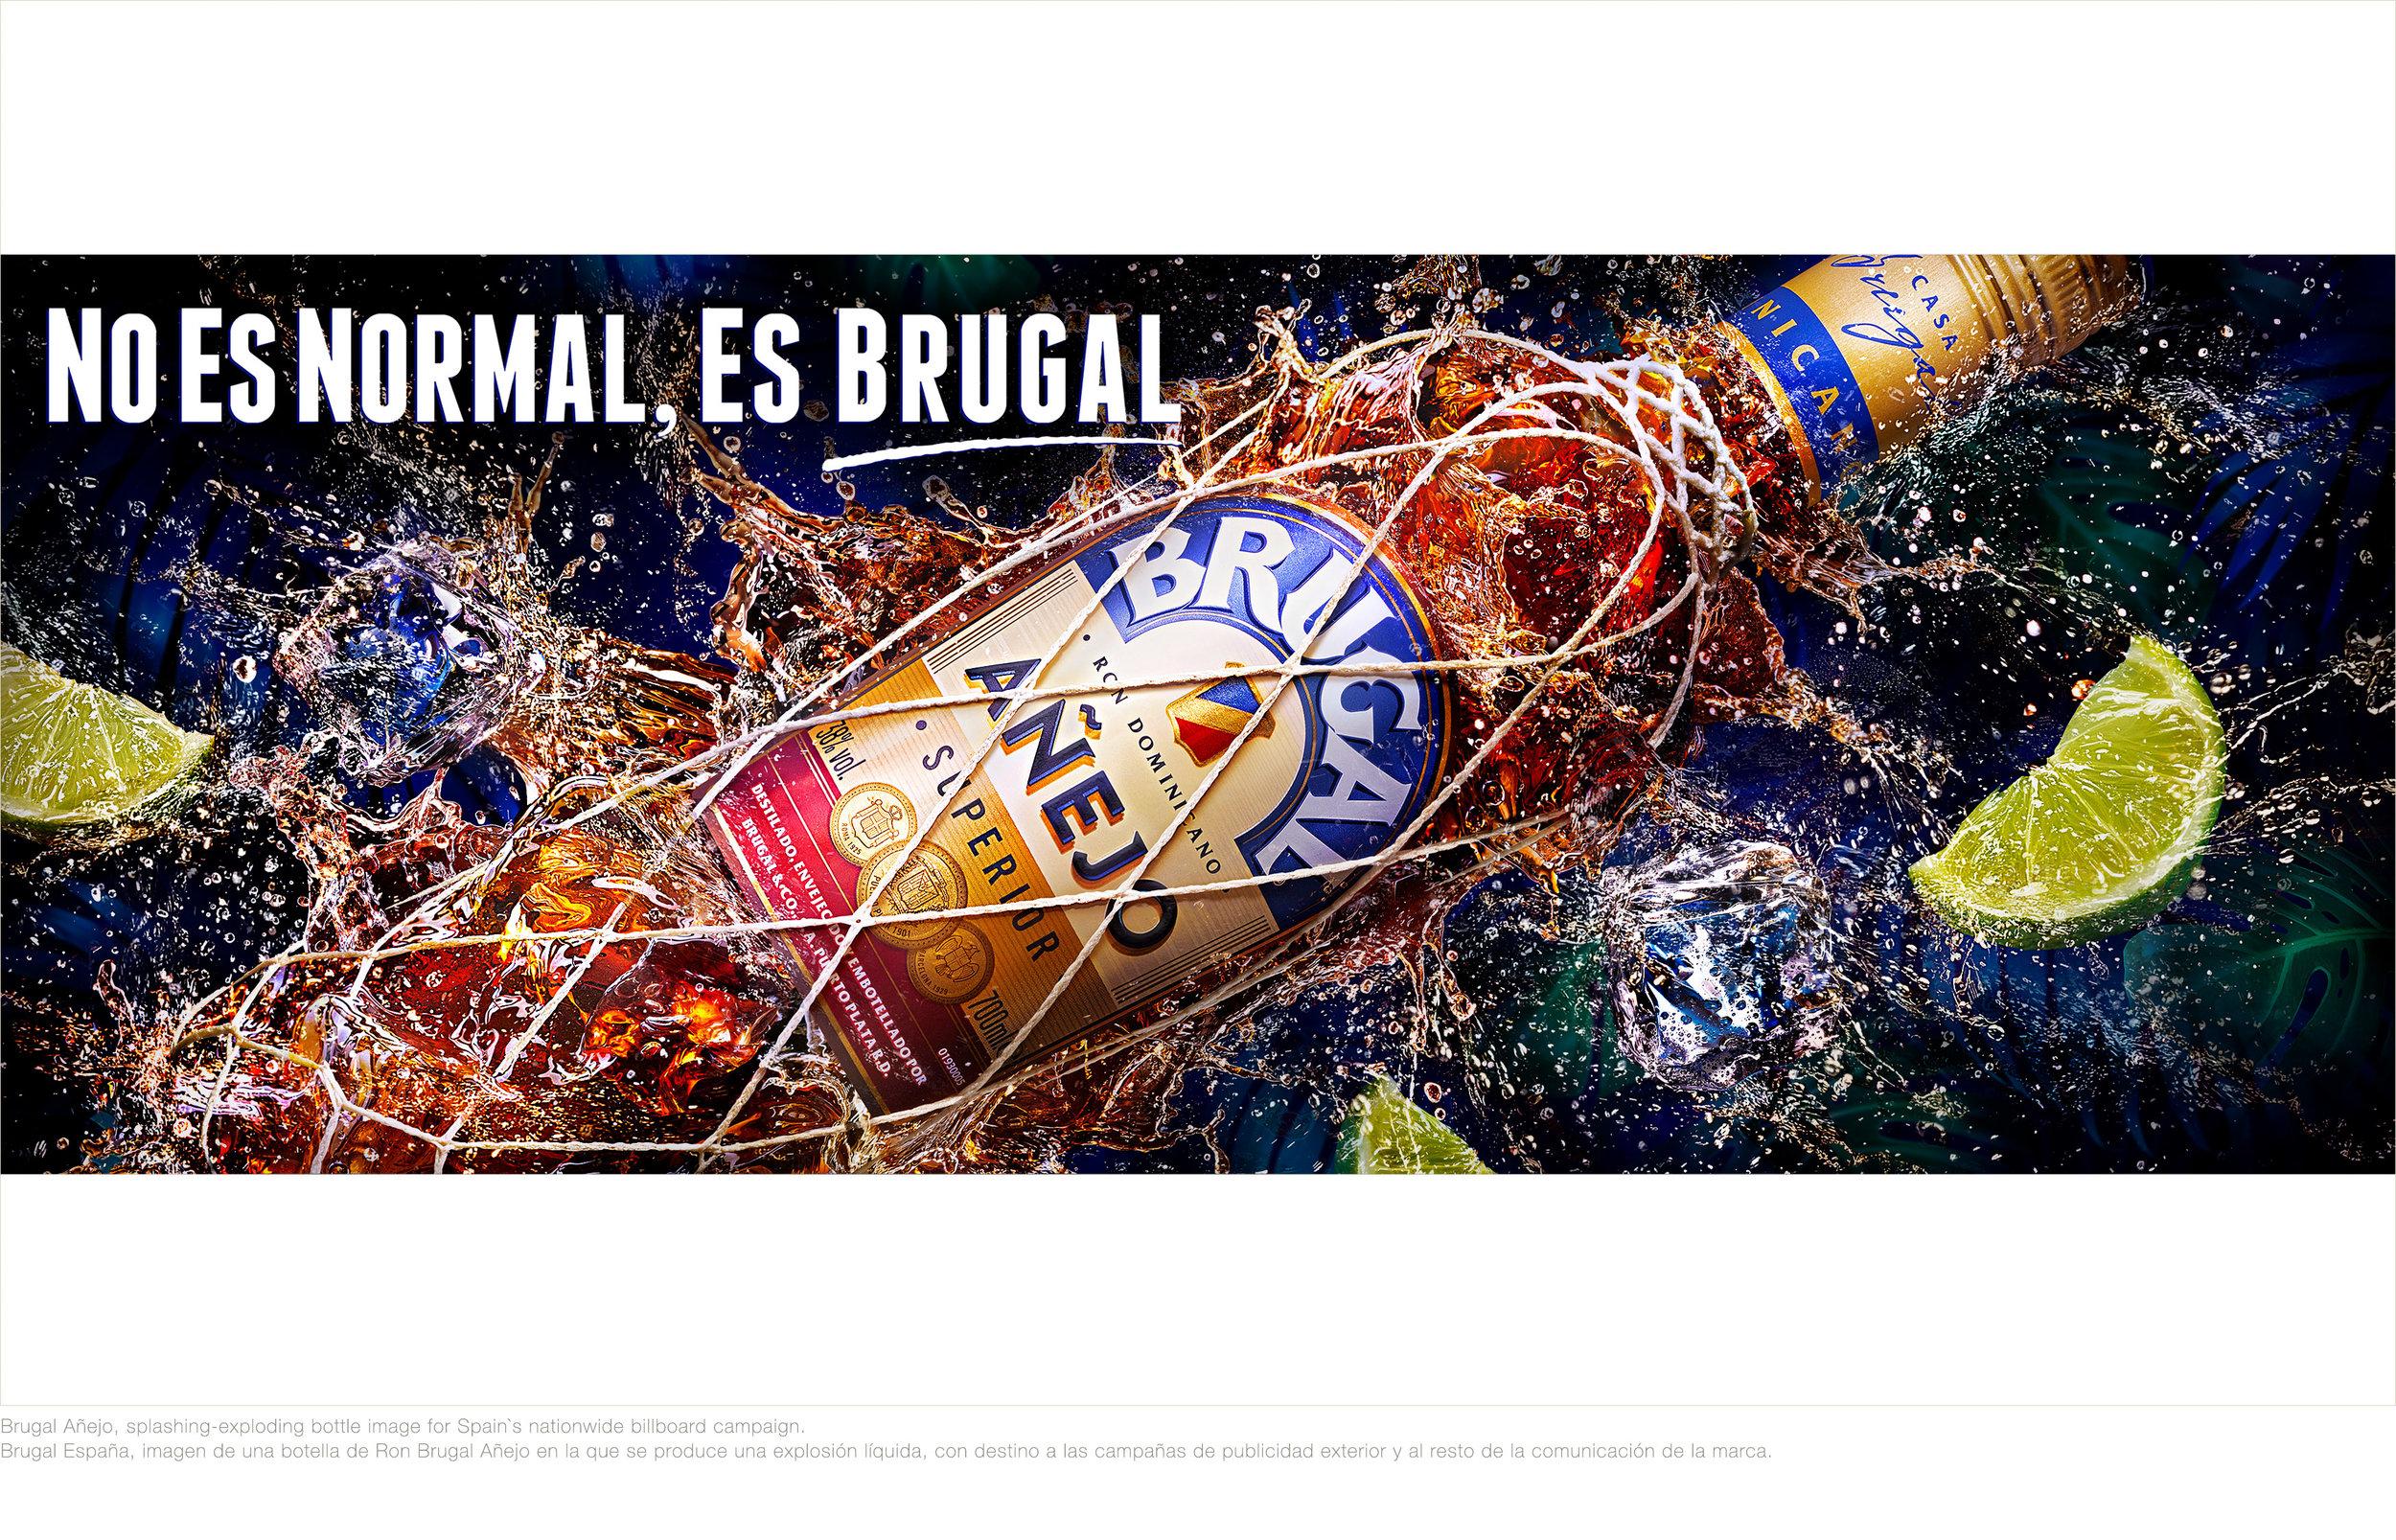 1611a-Brugal-BotellaExploding-2016-INT-02-20190610v05jpg.jpg